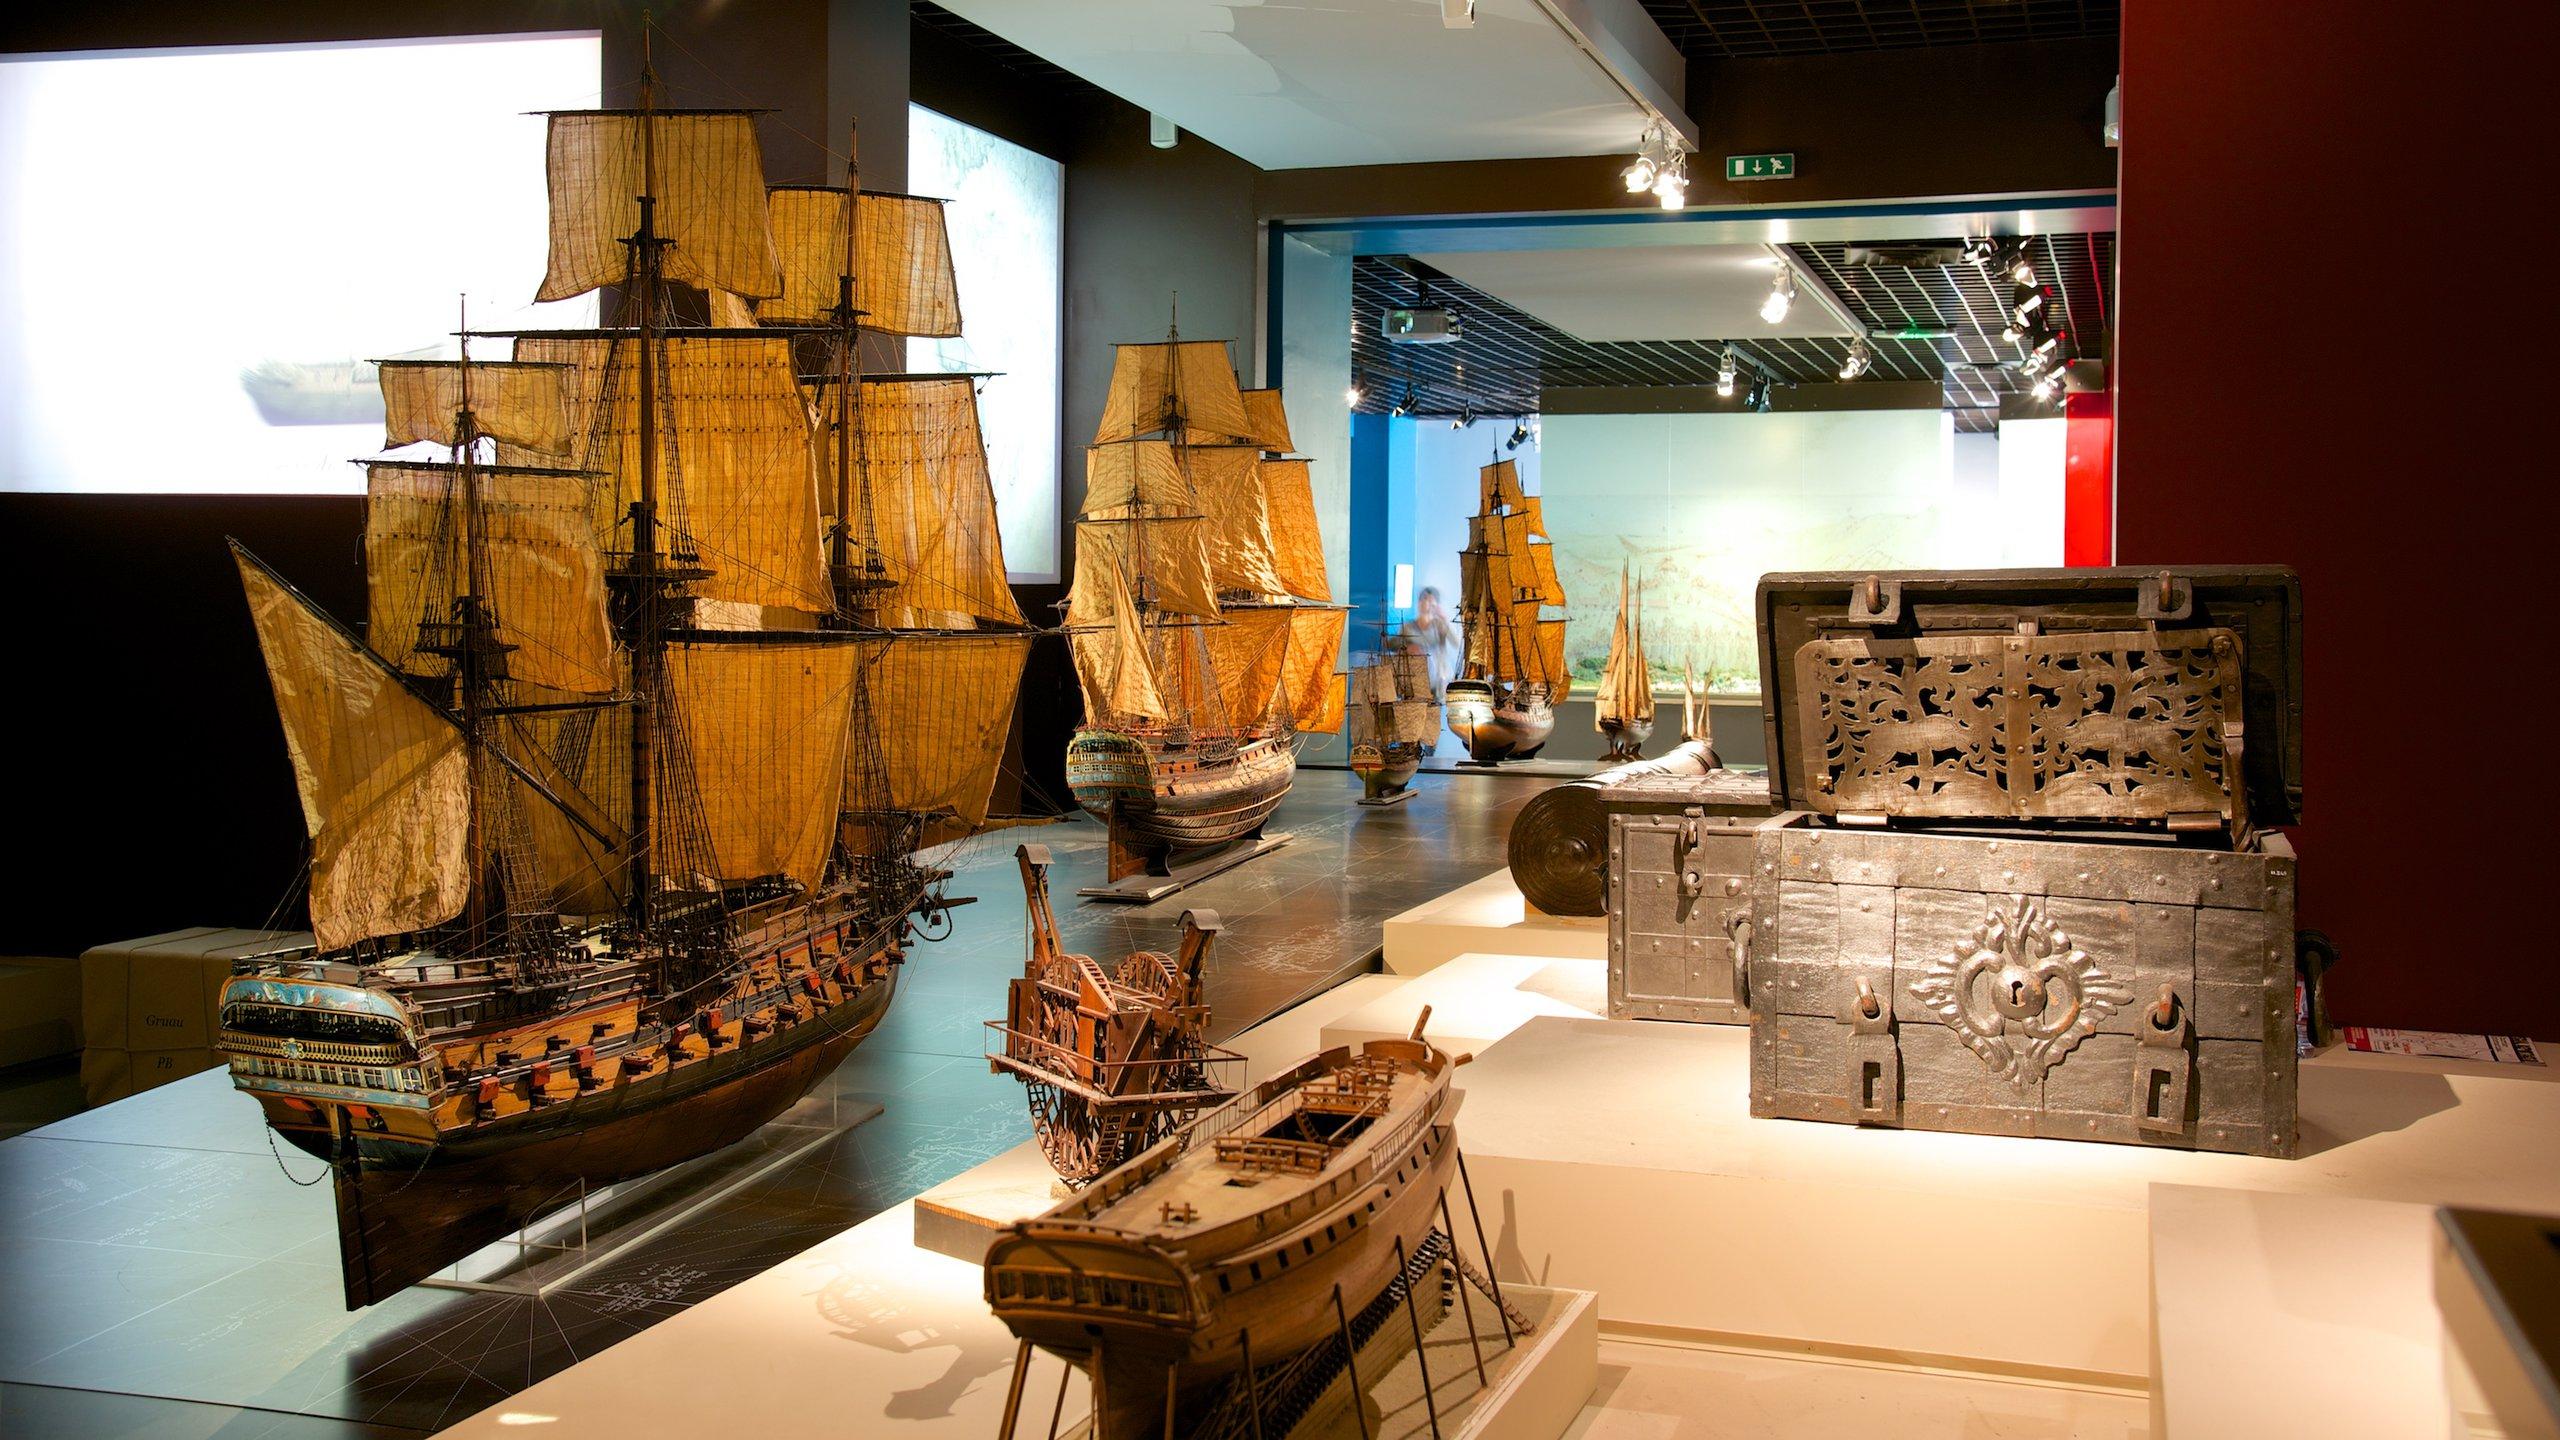 Aquitaine Museum, Bordeaux, Gironde, France